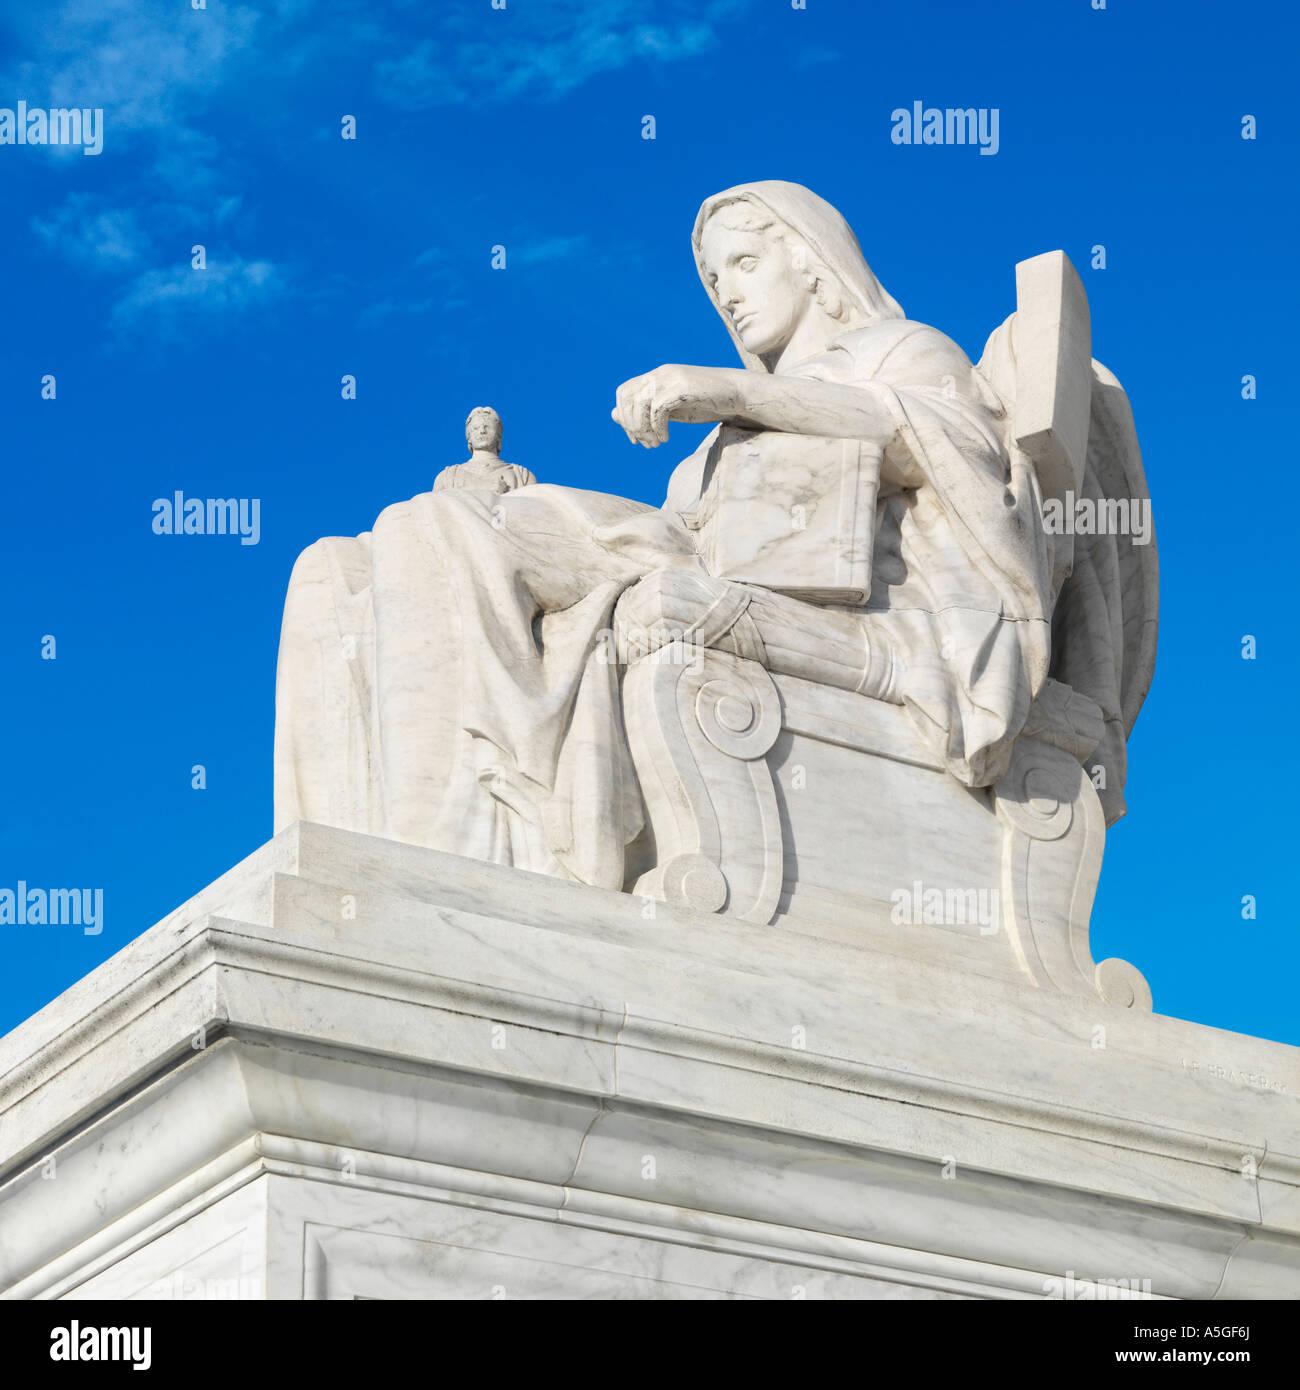 Statue at Supreme Court in Washington DC - Stock Image